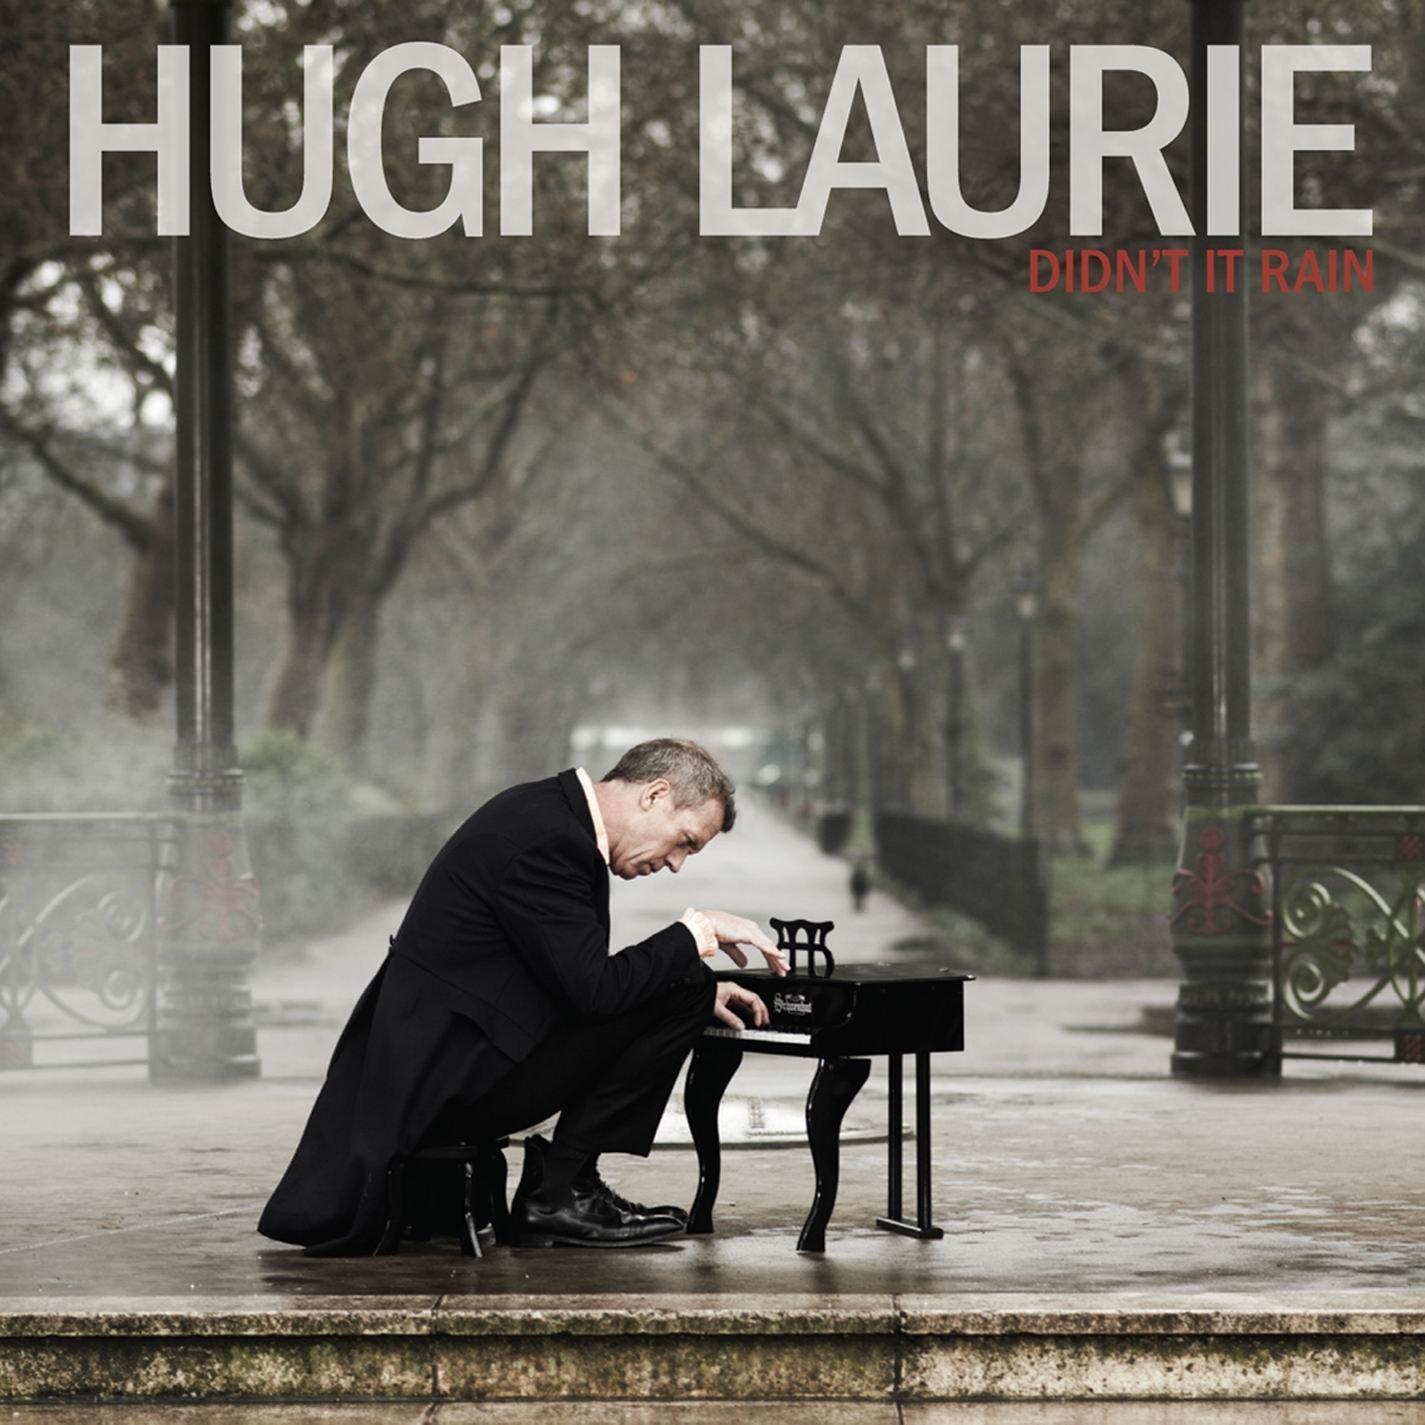 Hugh Laurie Didn't It Rain Album Artwork